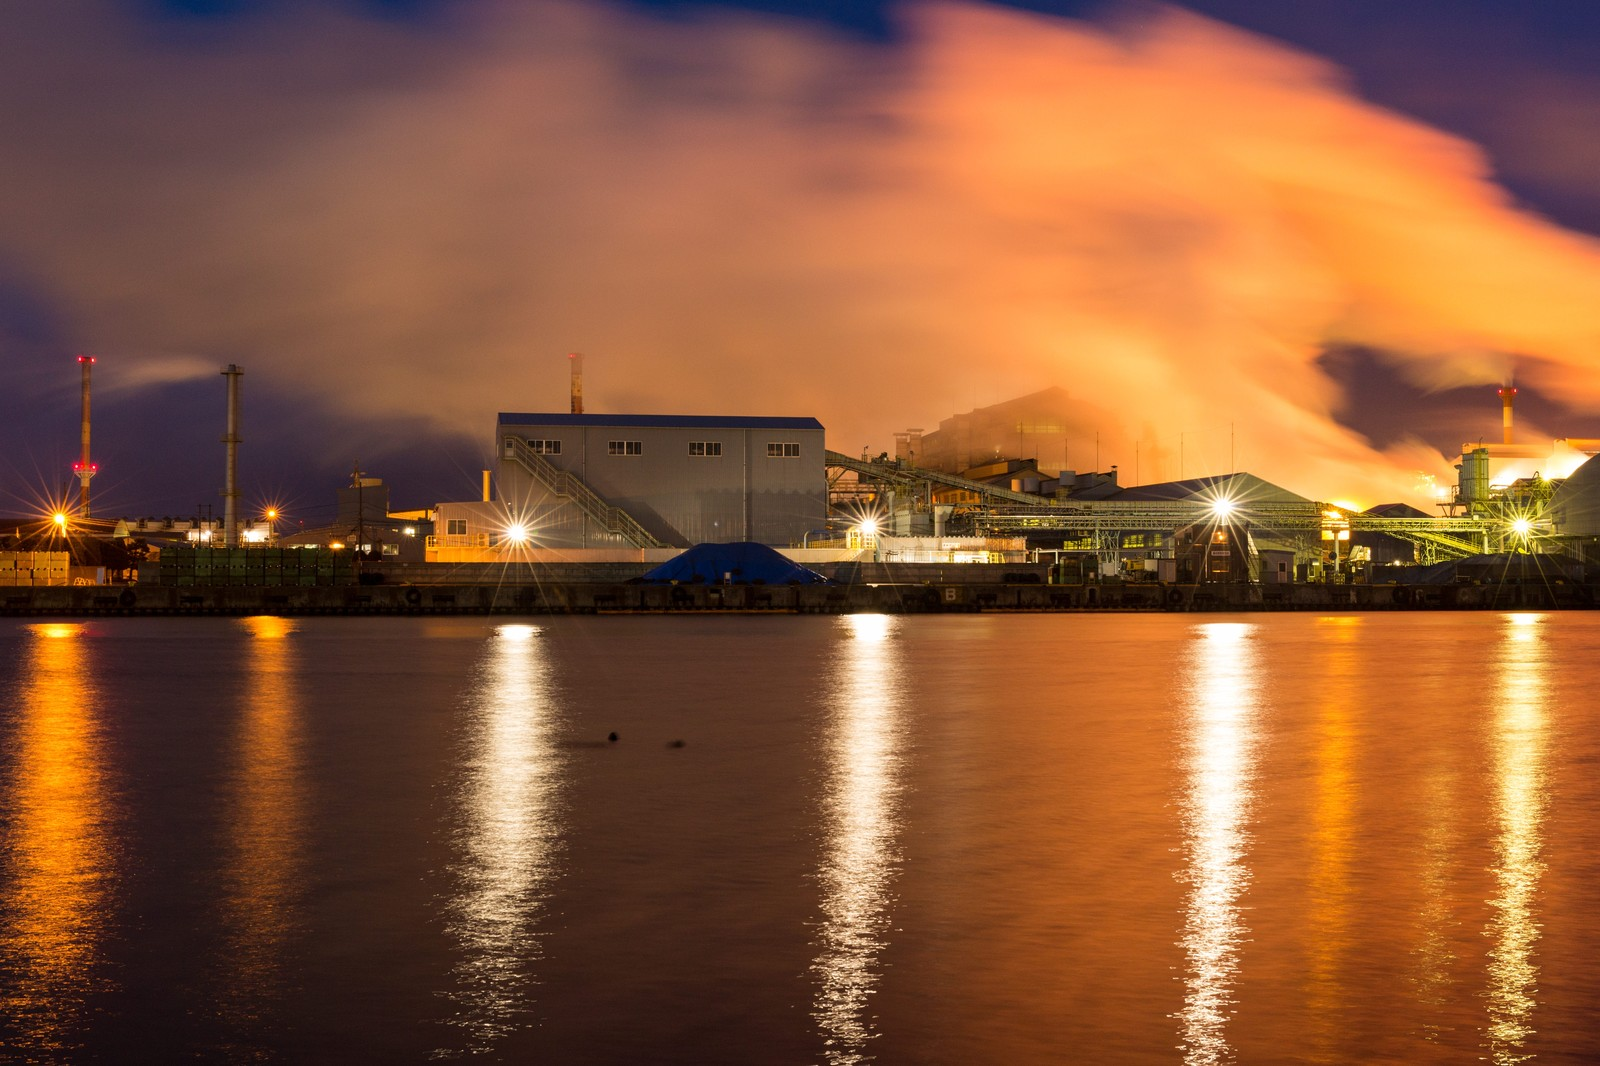 「八戸工場夜景八戸工場夜景」のフリー写真素材を拡大